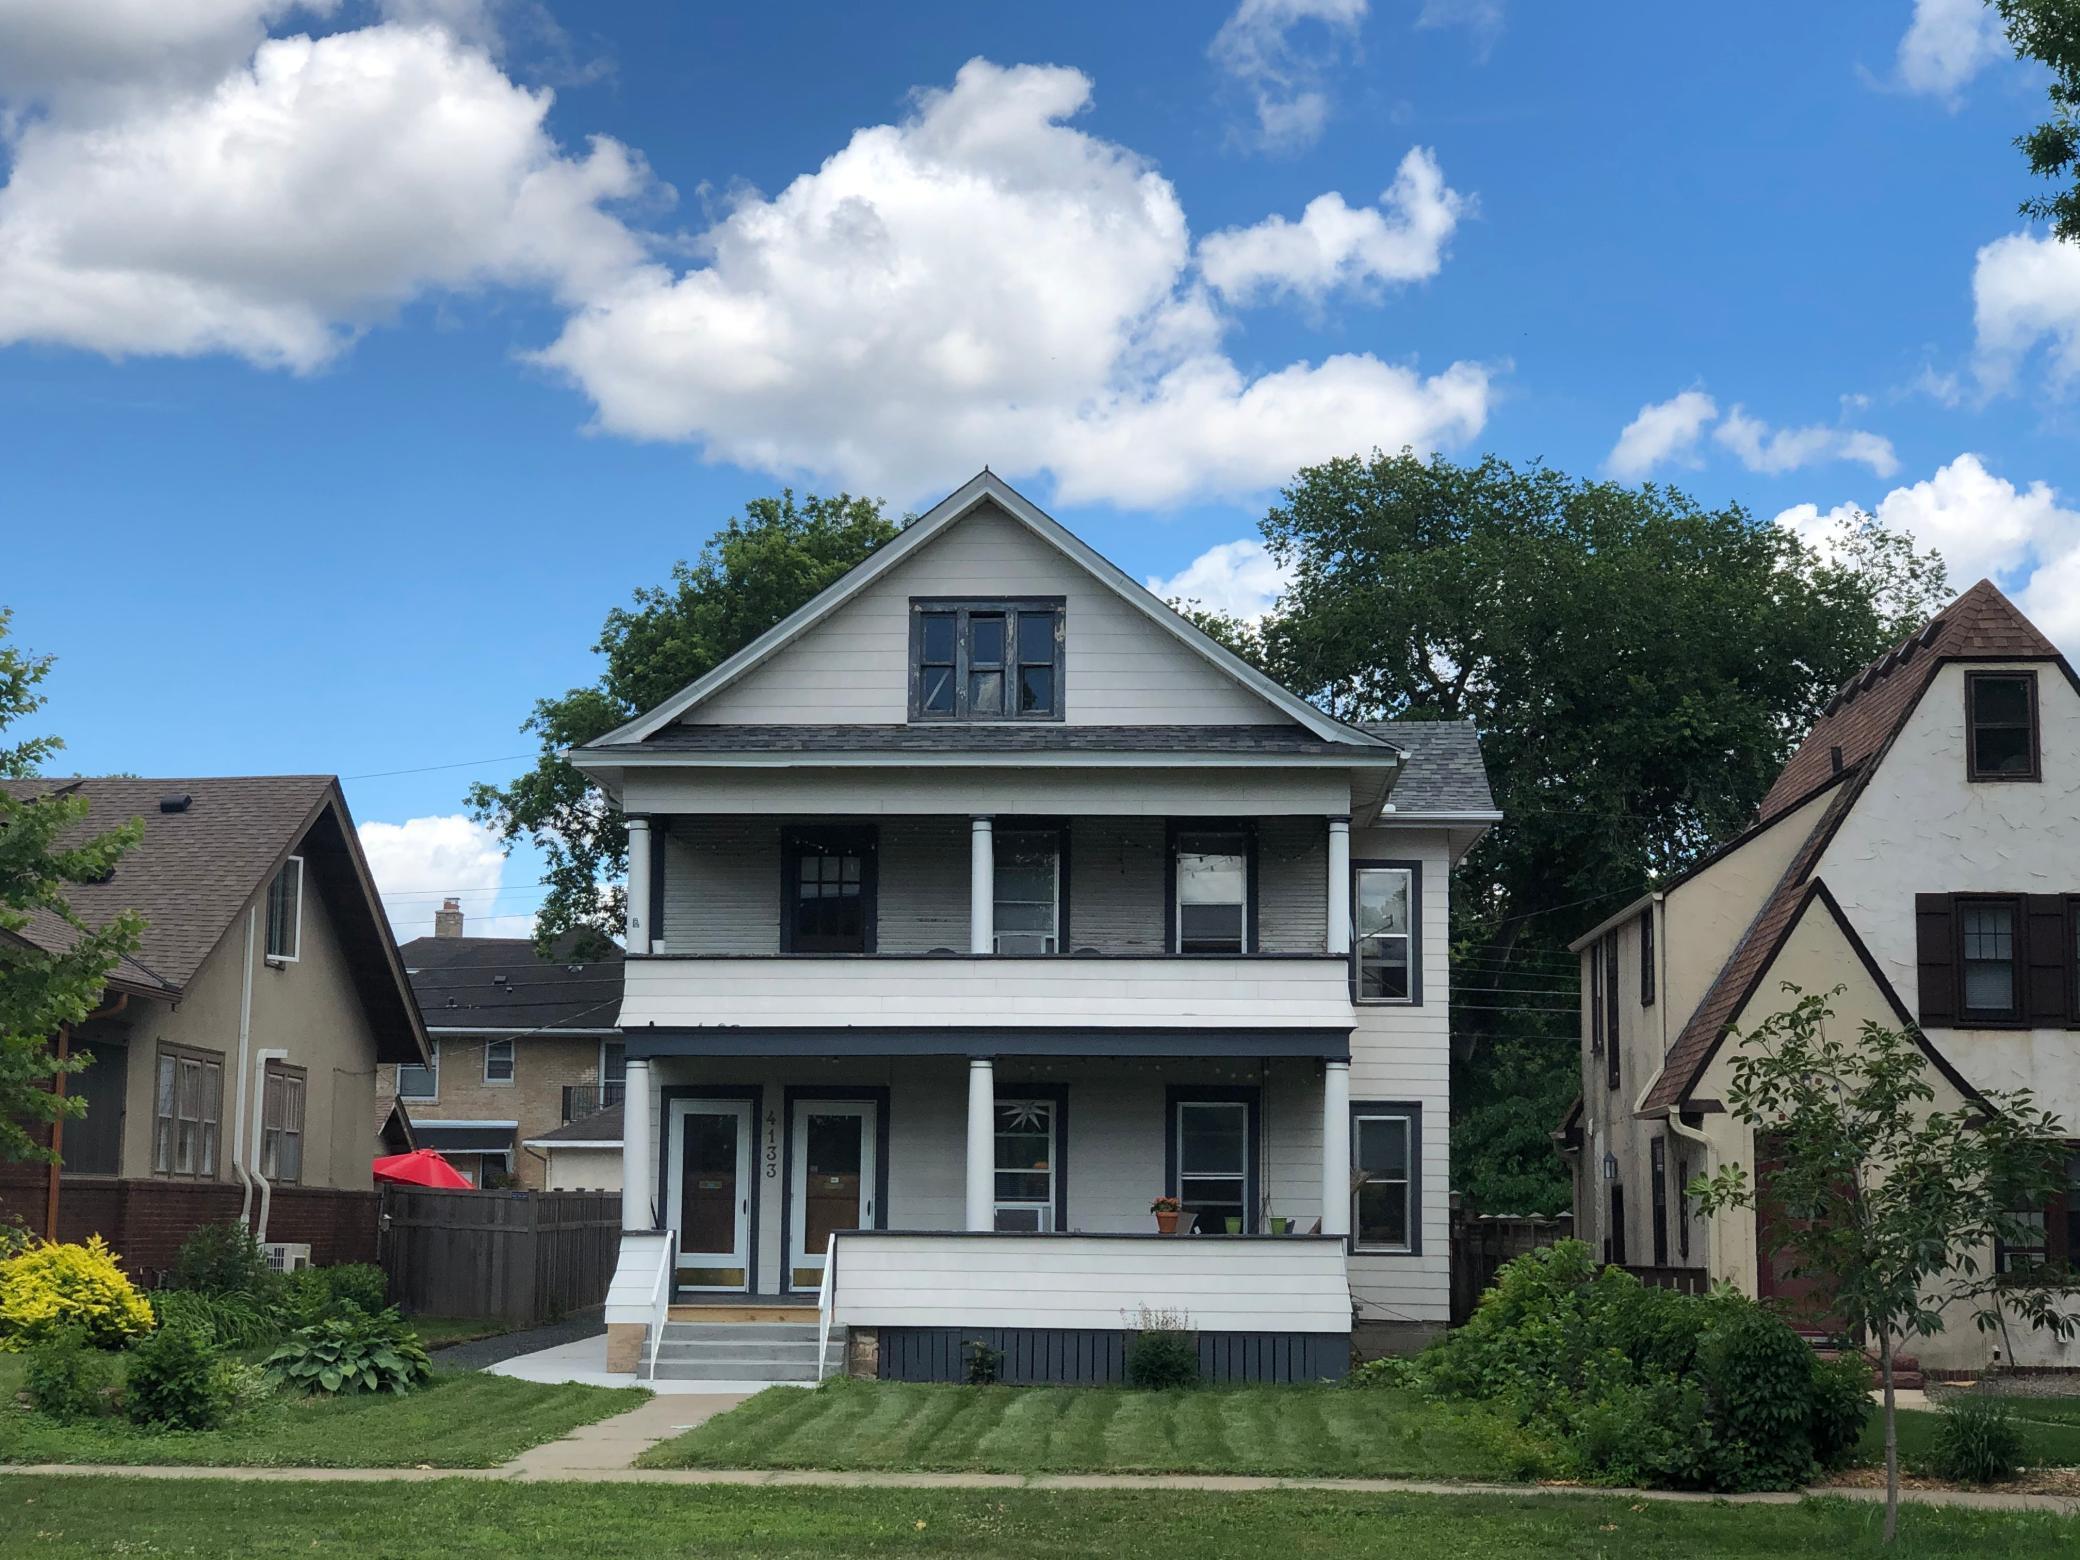 4133 Lyndale S Property Photo - Minneapolis, MN real estate listing